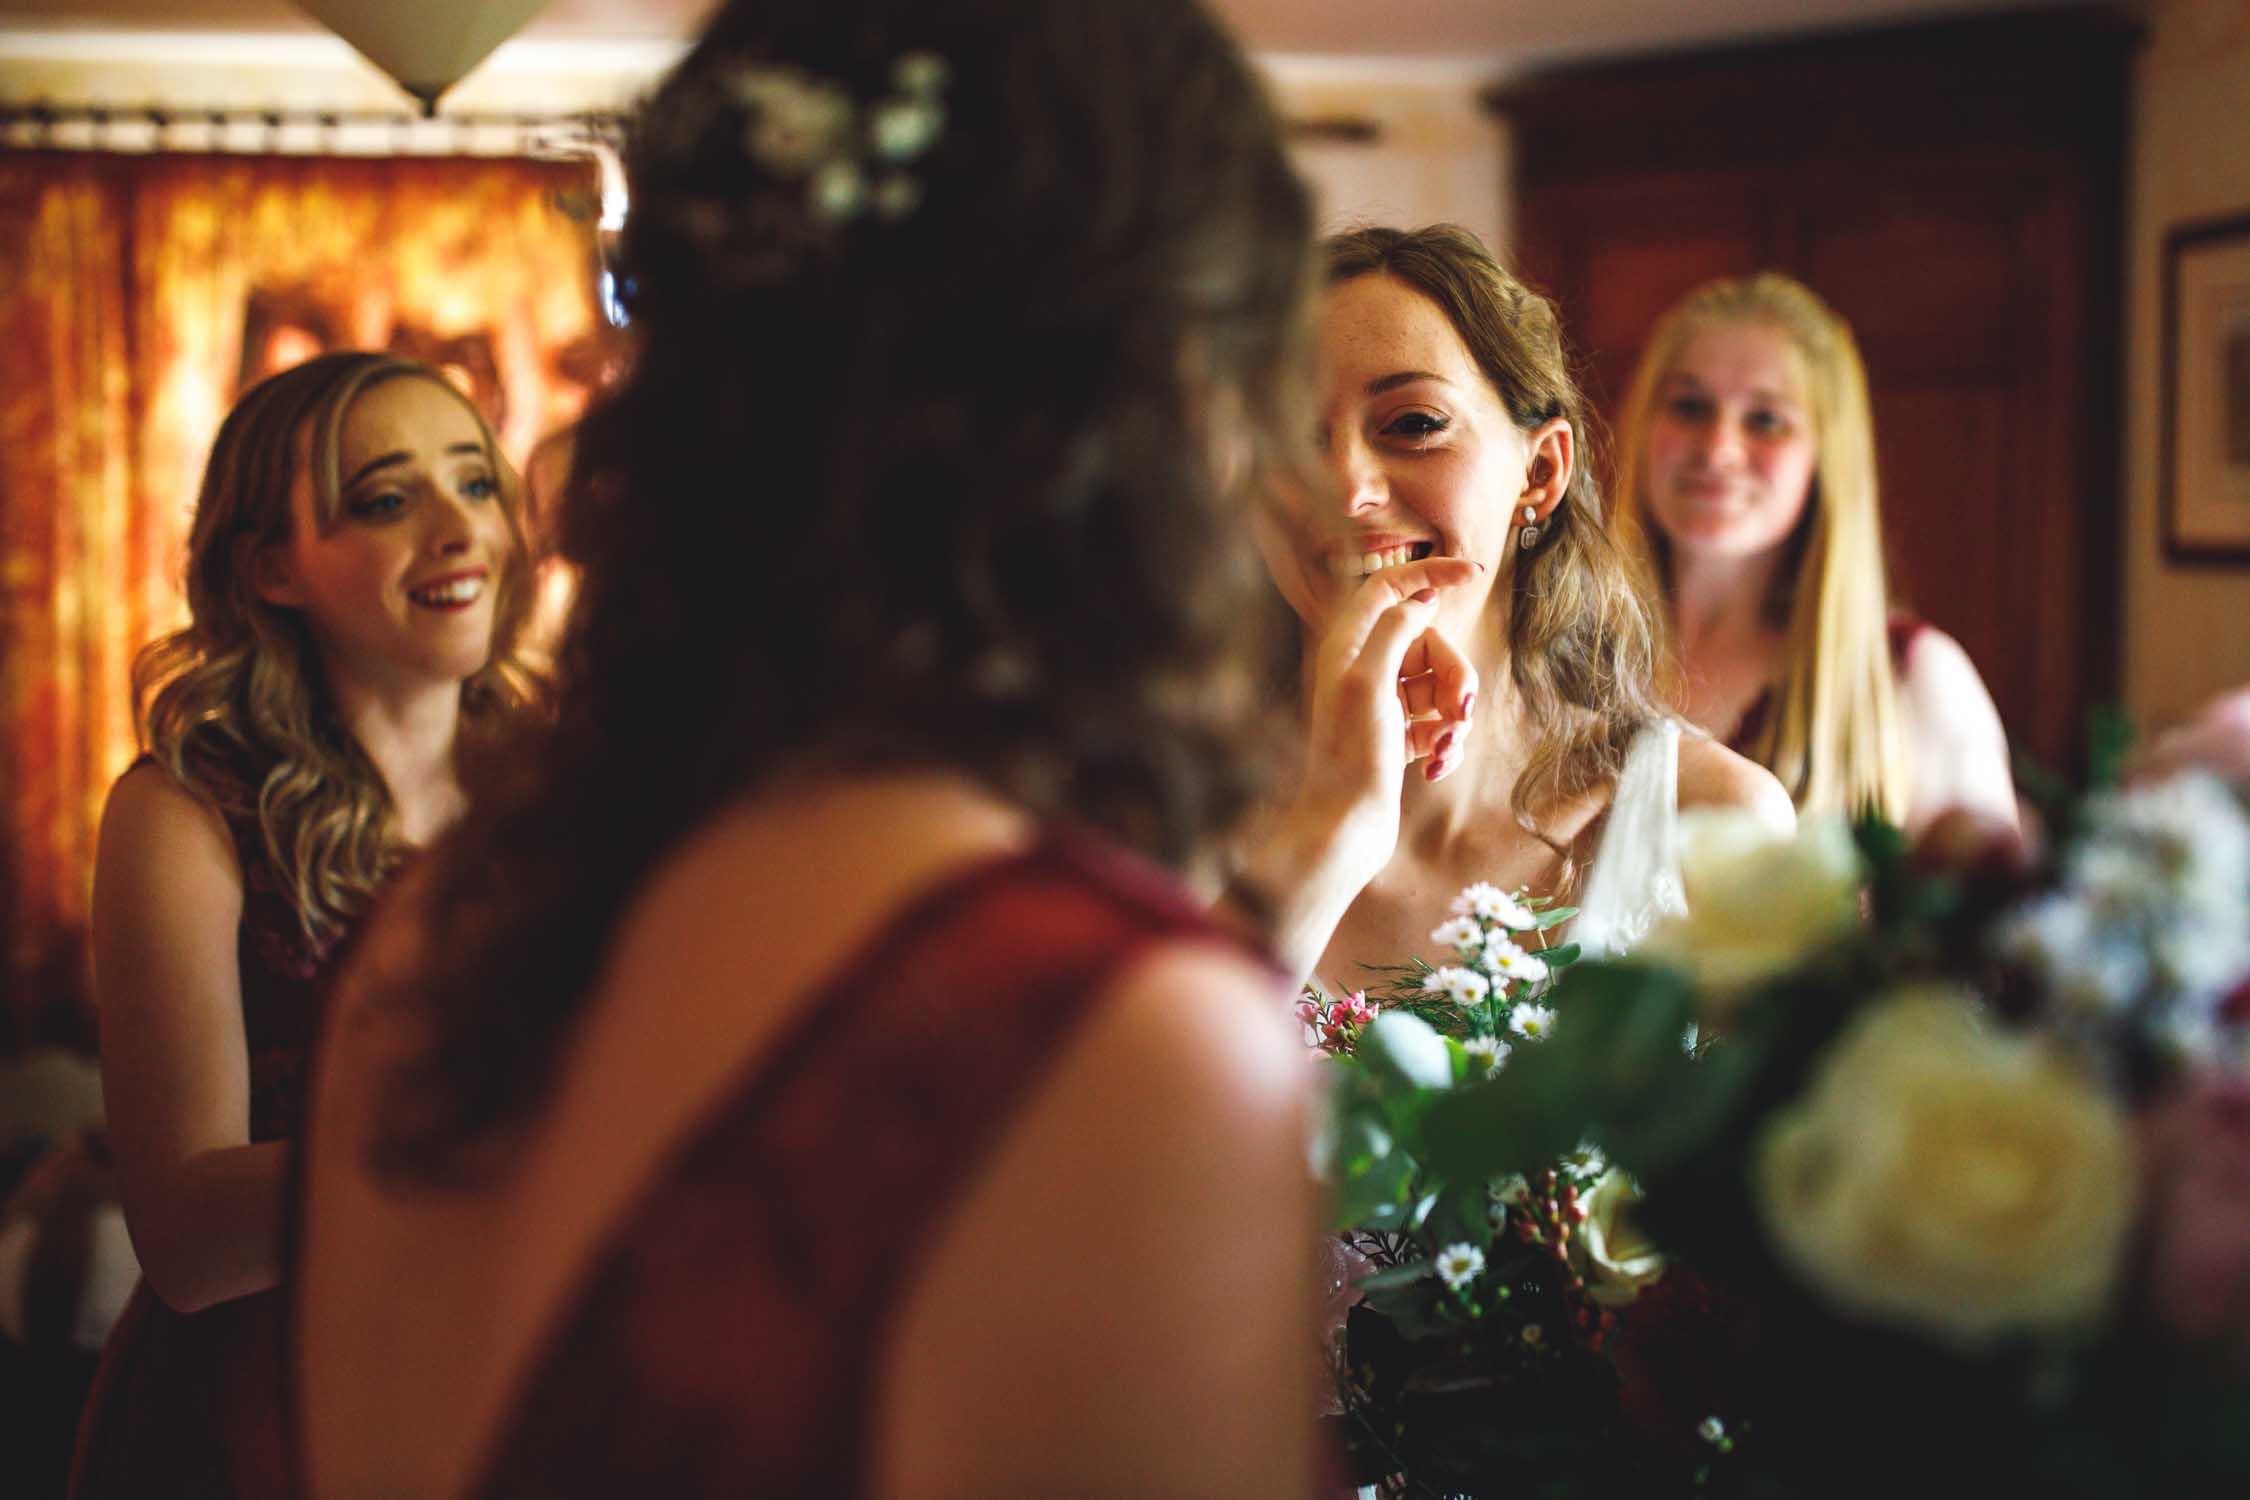 Wedding, Herefordshire, photography, Wedding Photographers in Herefordshire, Herefordshire wedding photography